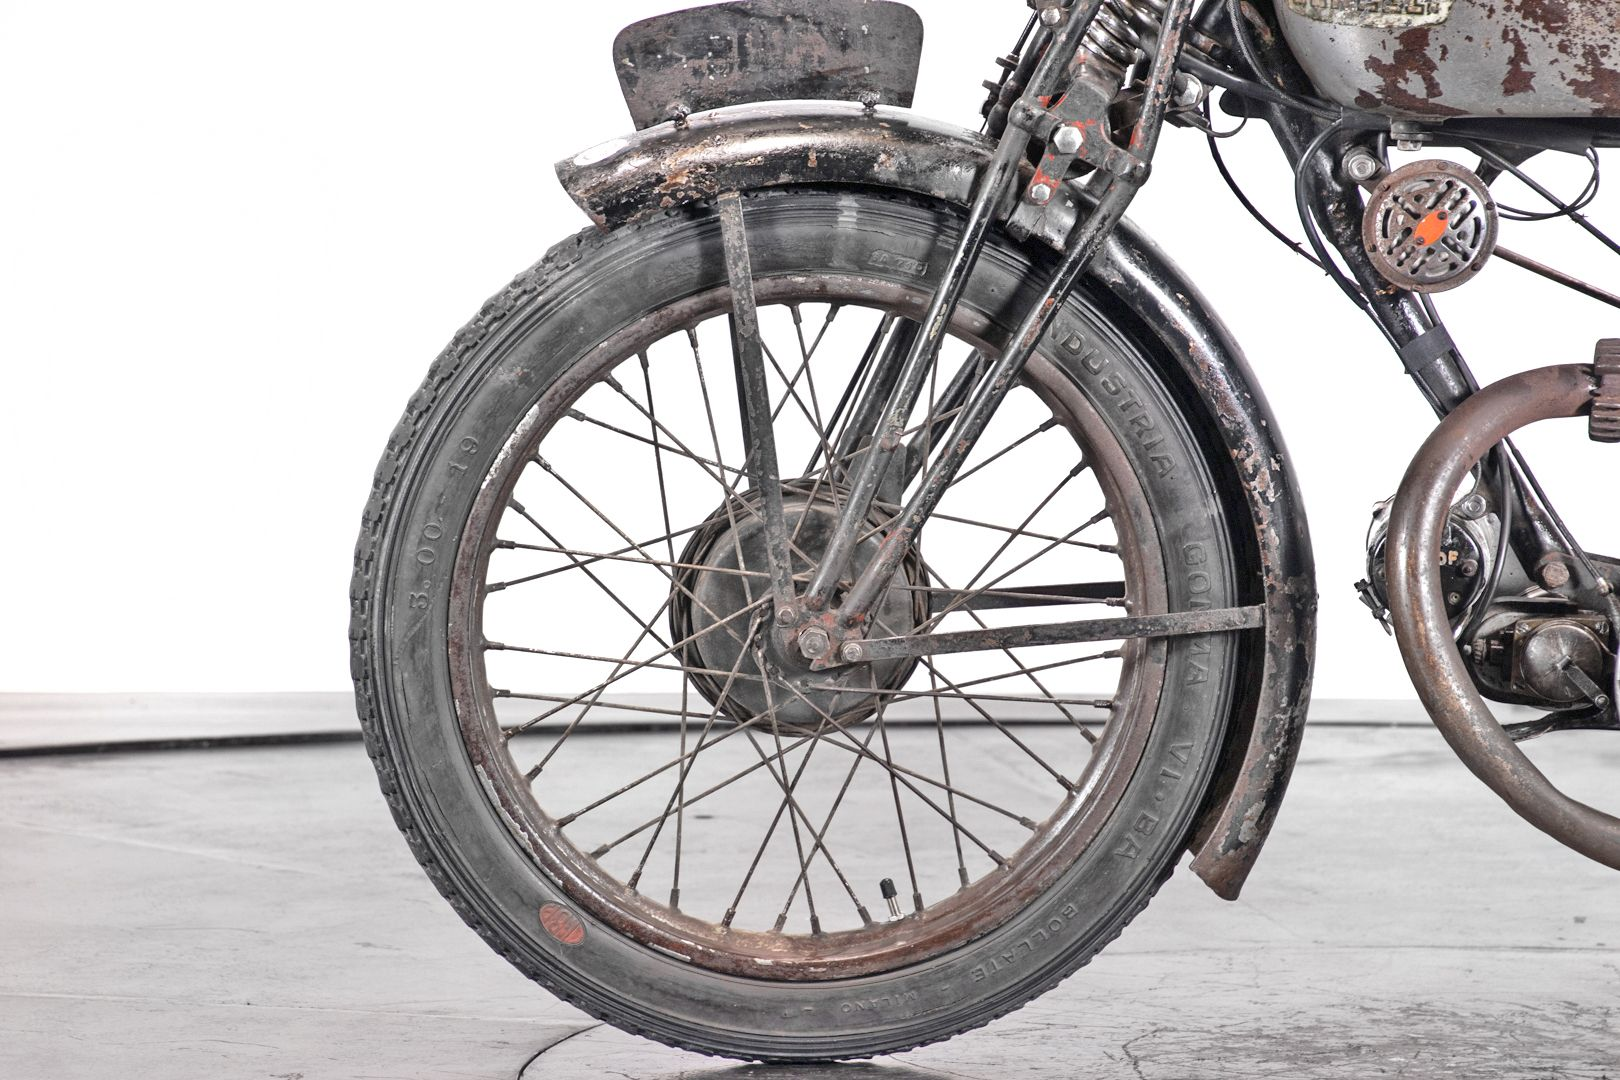 1938 Benelli 175 74493